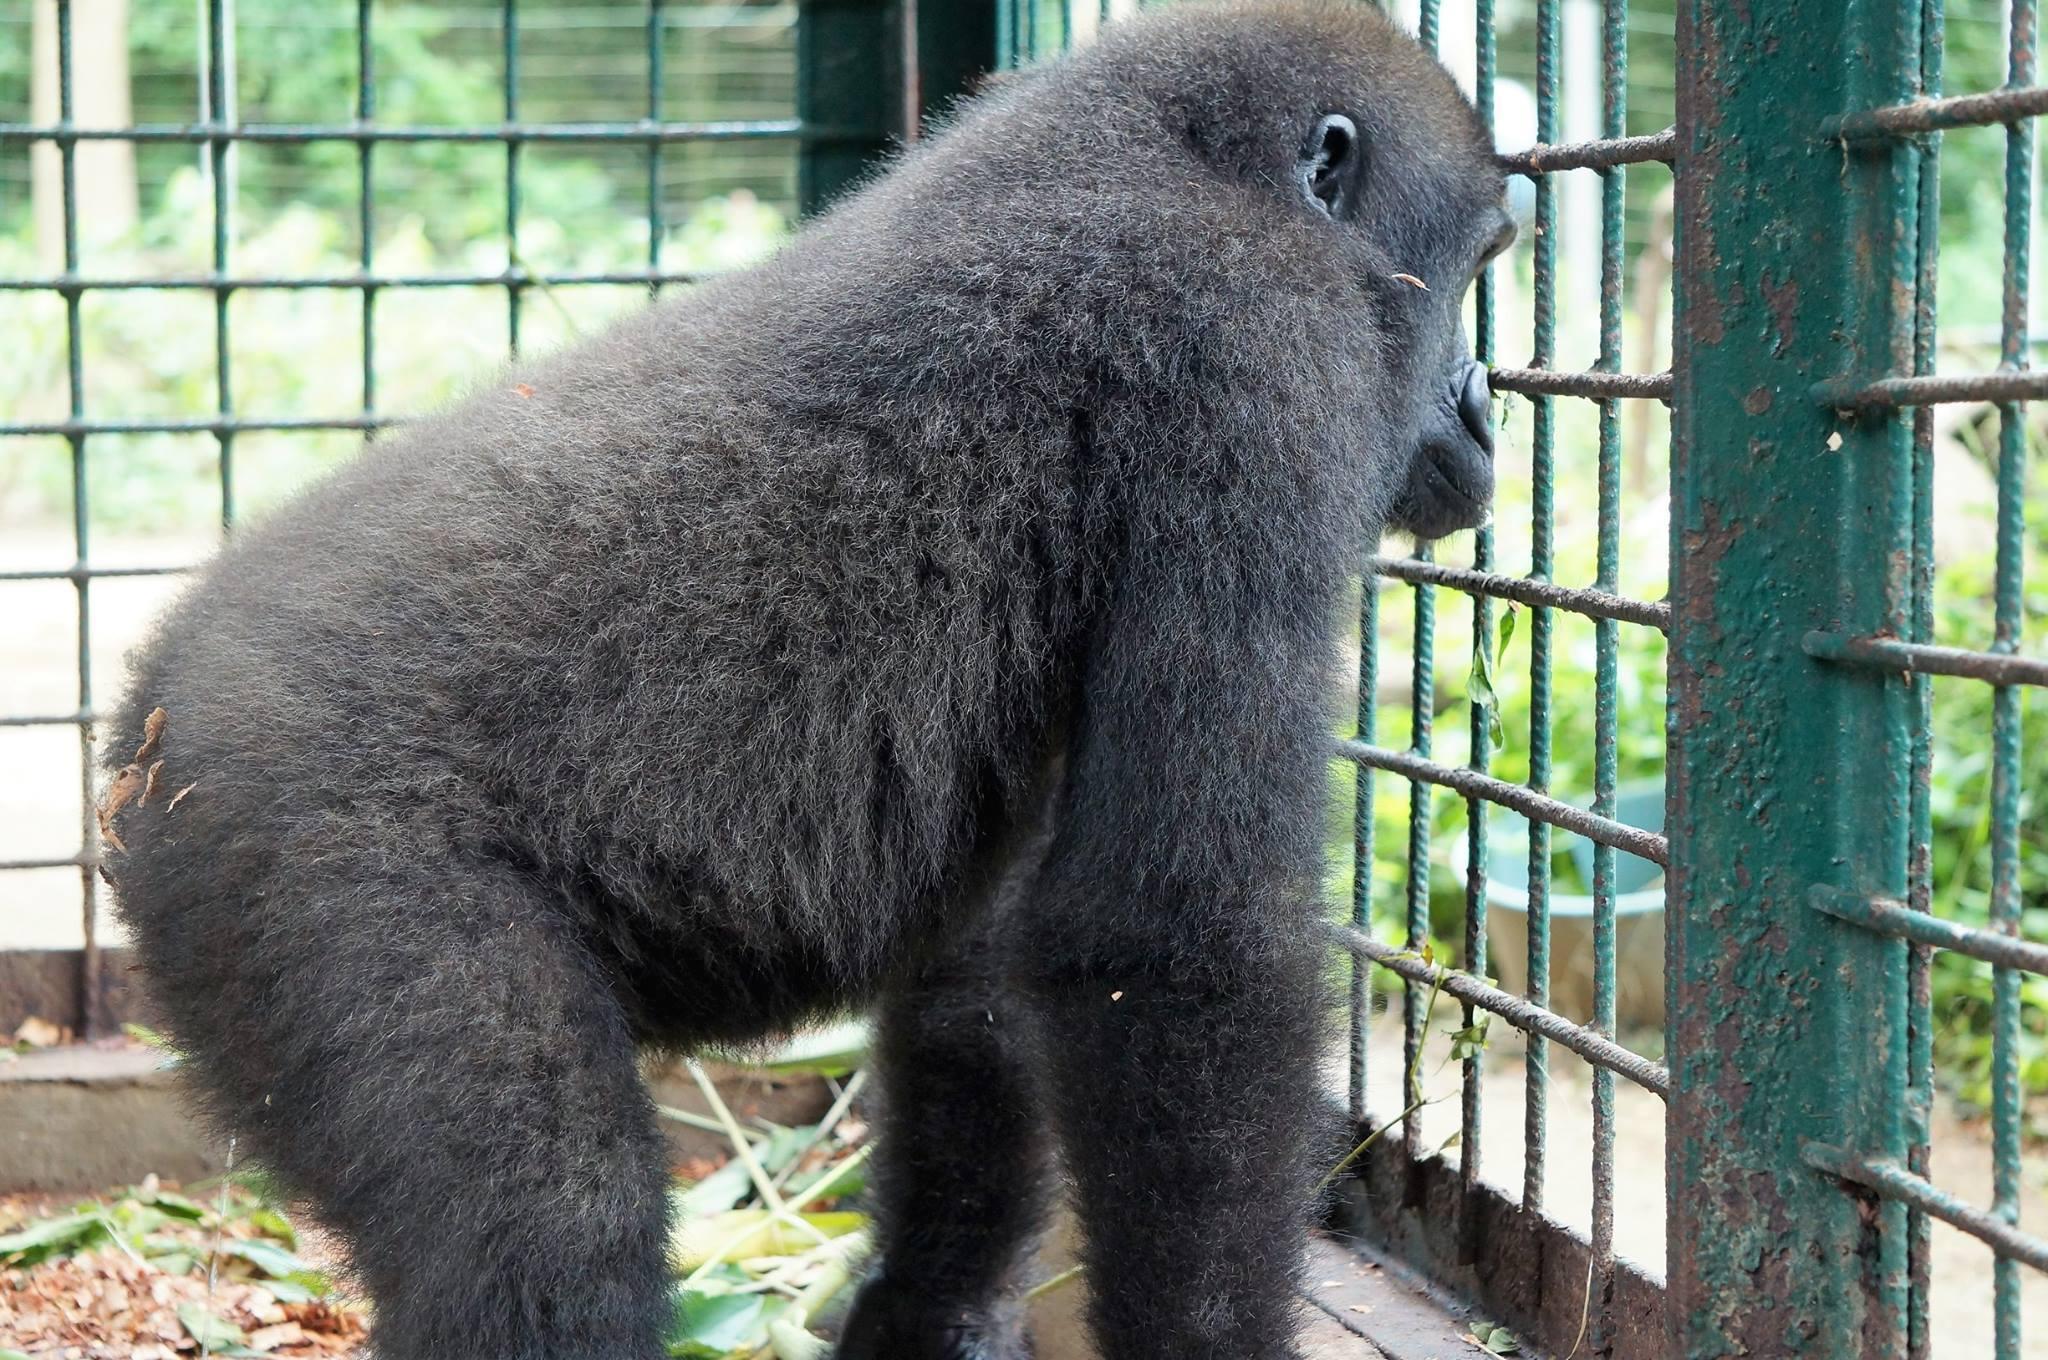 parry-gorilla-8